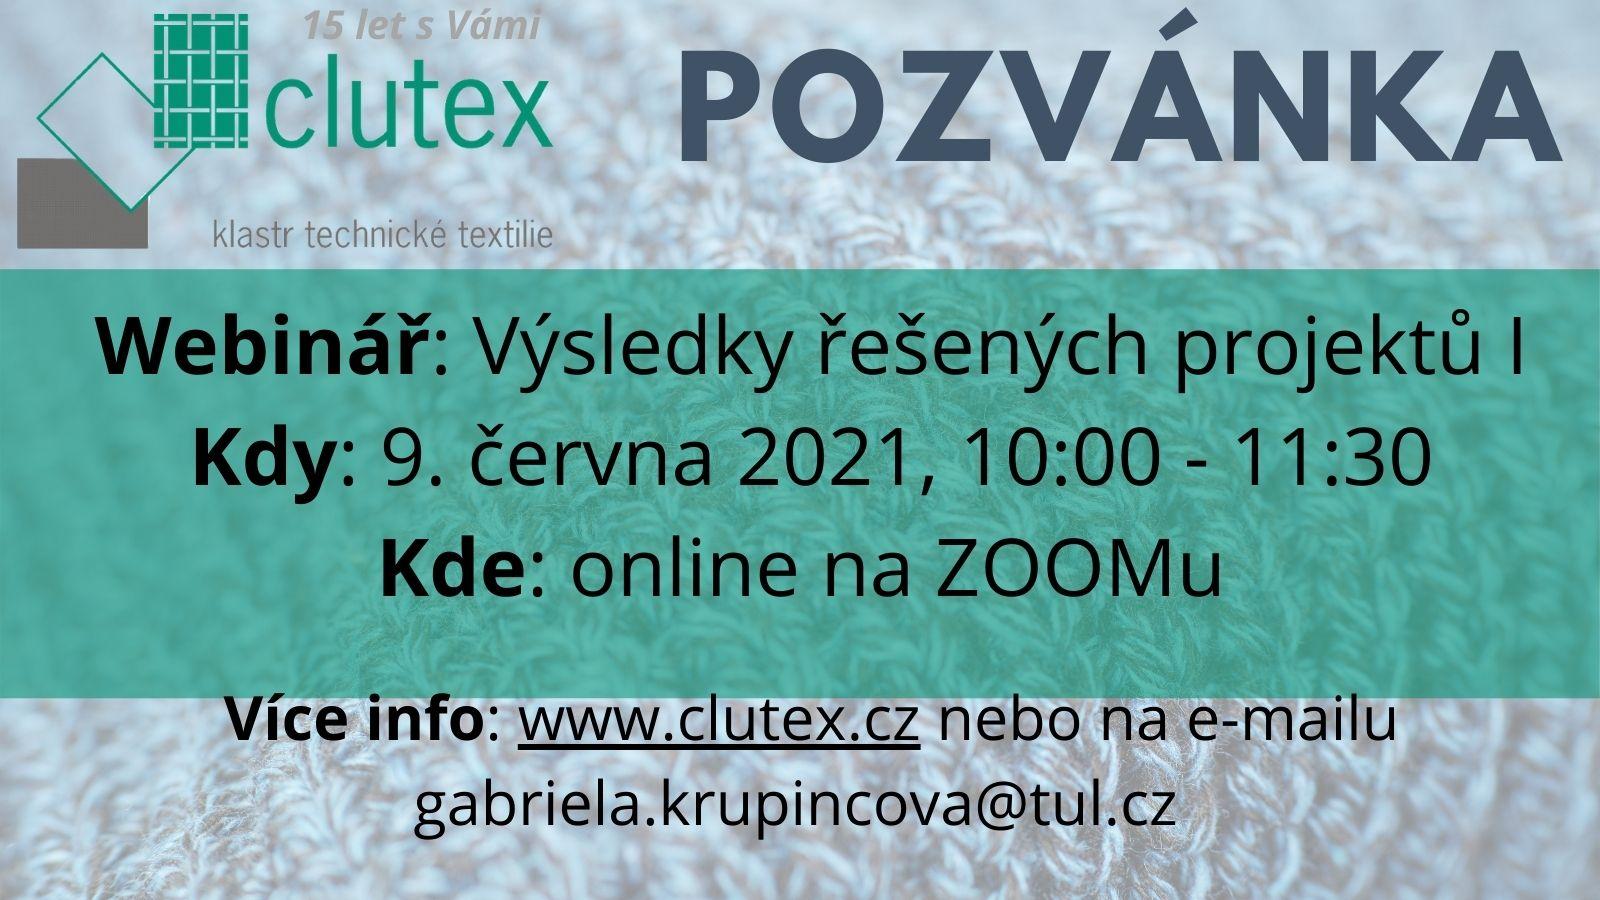 http://www.clutex.cz/aktuality/webinar:-vysledky-resenych-projektu-i-inspirujte-se-u-uspesnych-resitelu-9-cervna-2021.htm